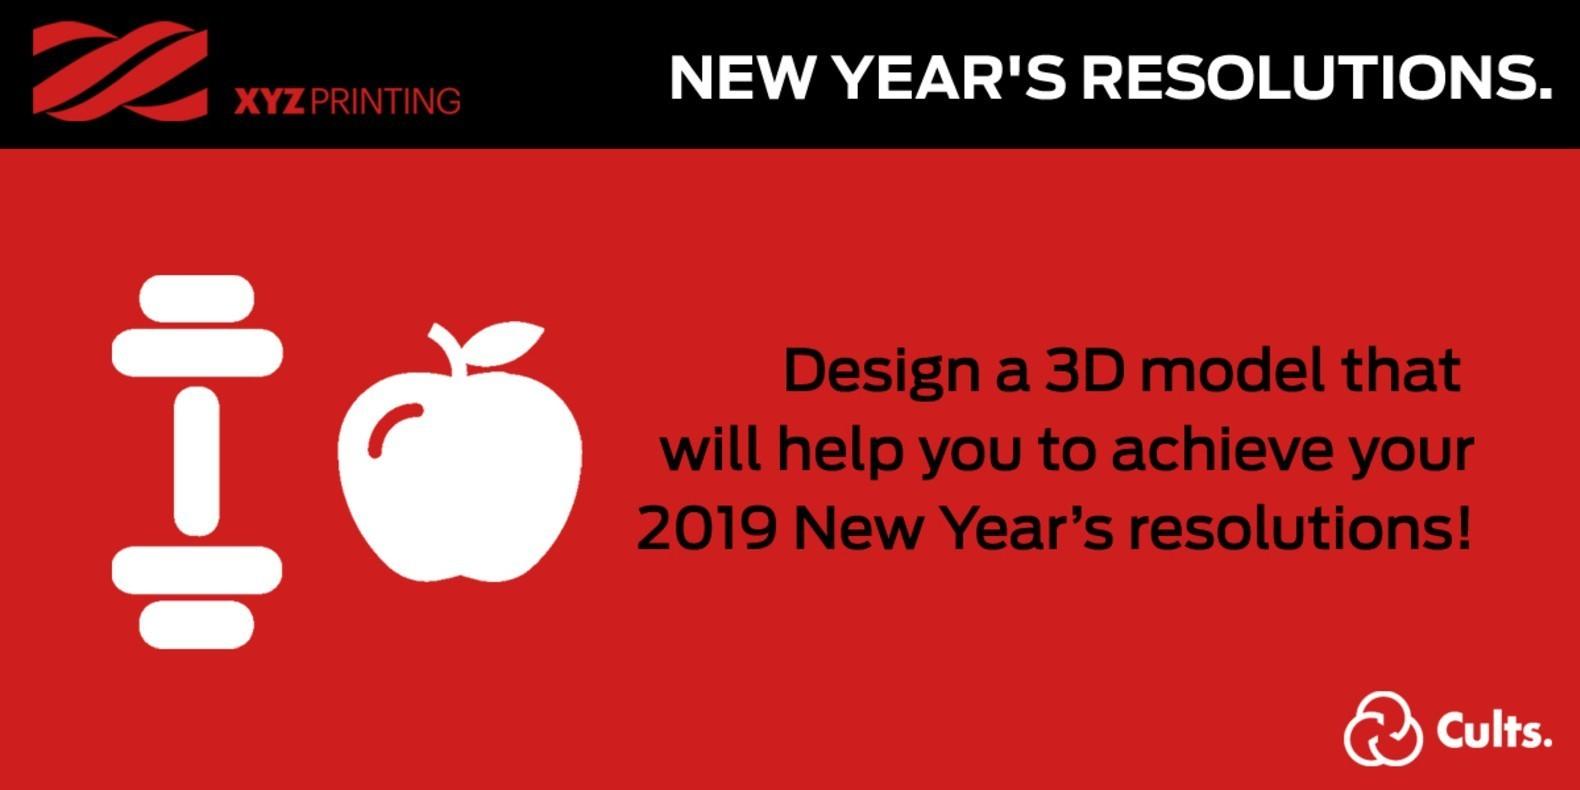 Contest 3D Printing XYZPrinting